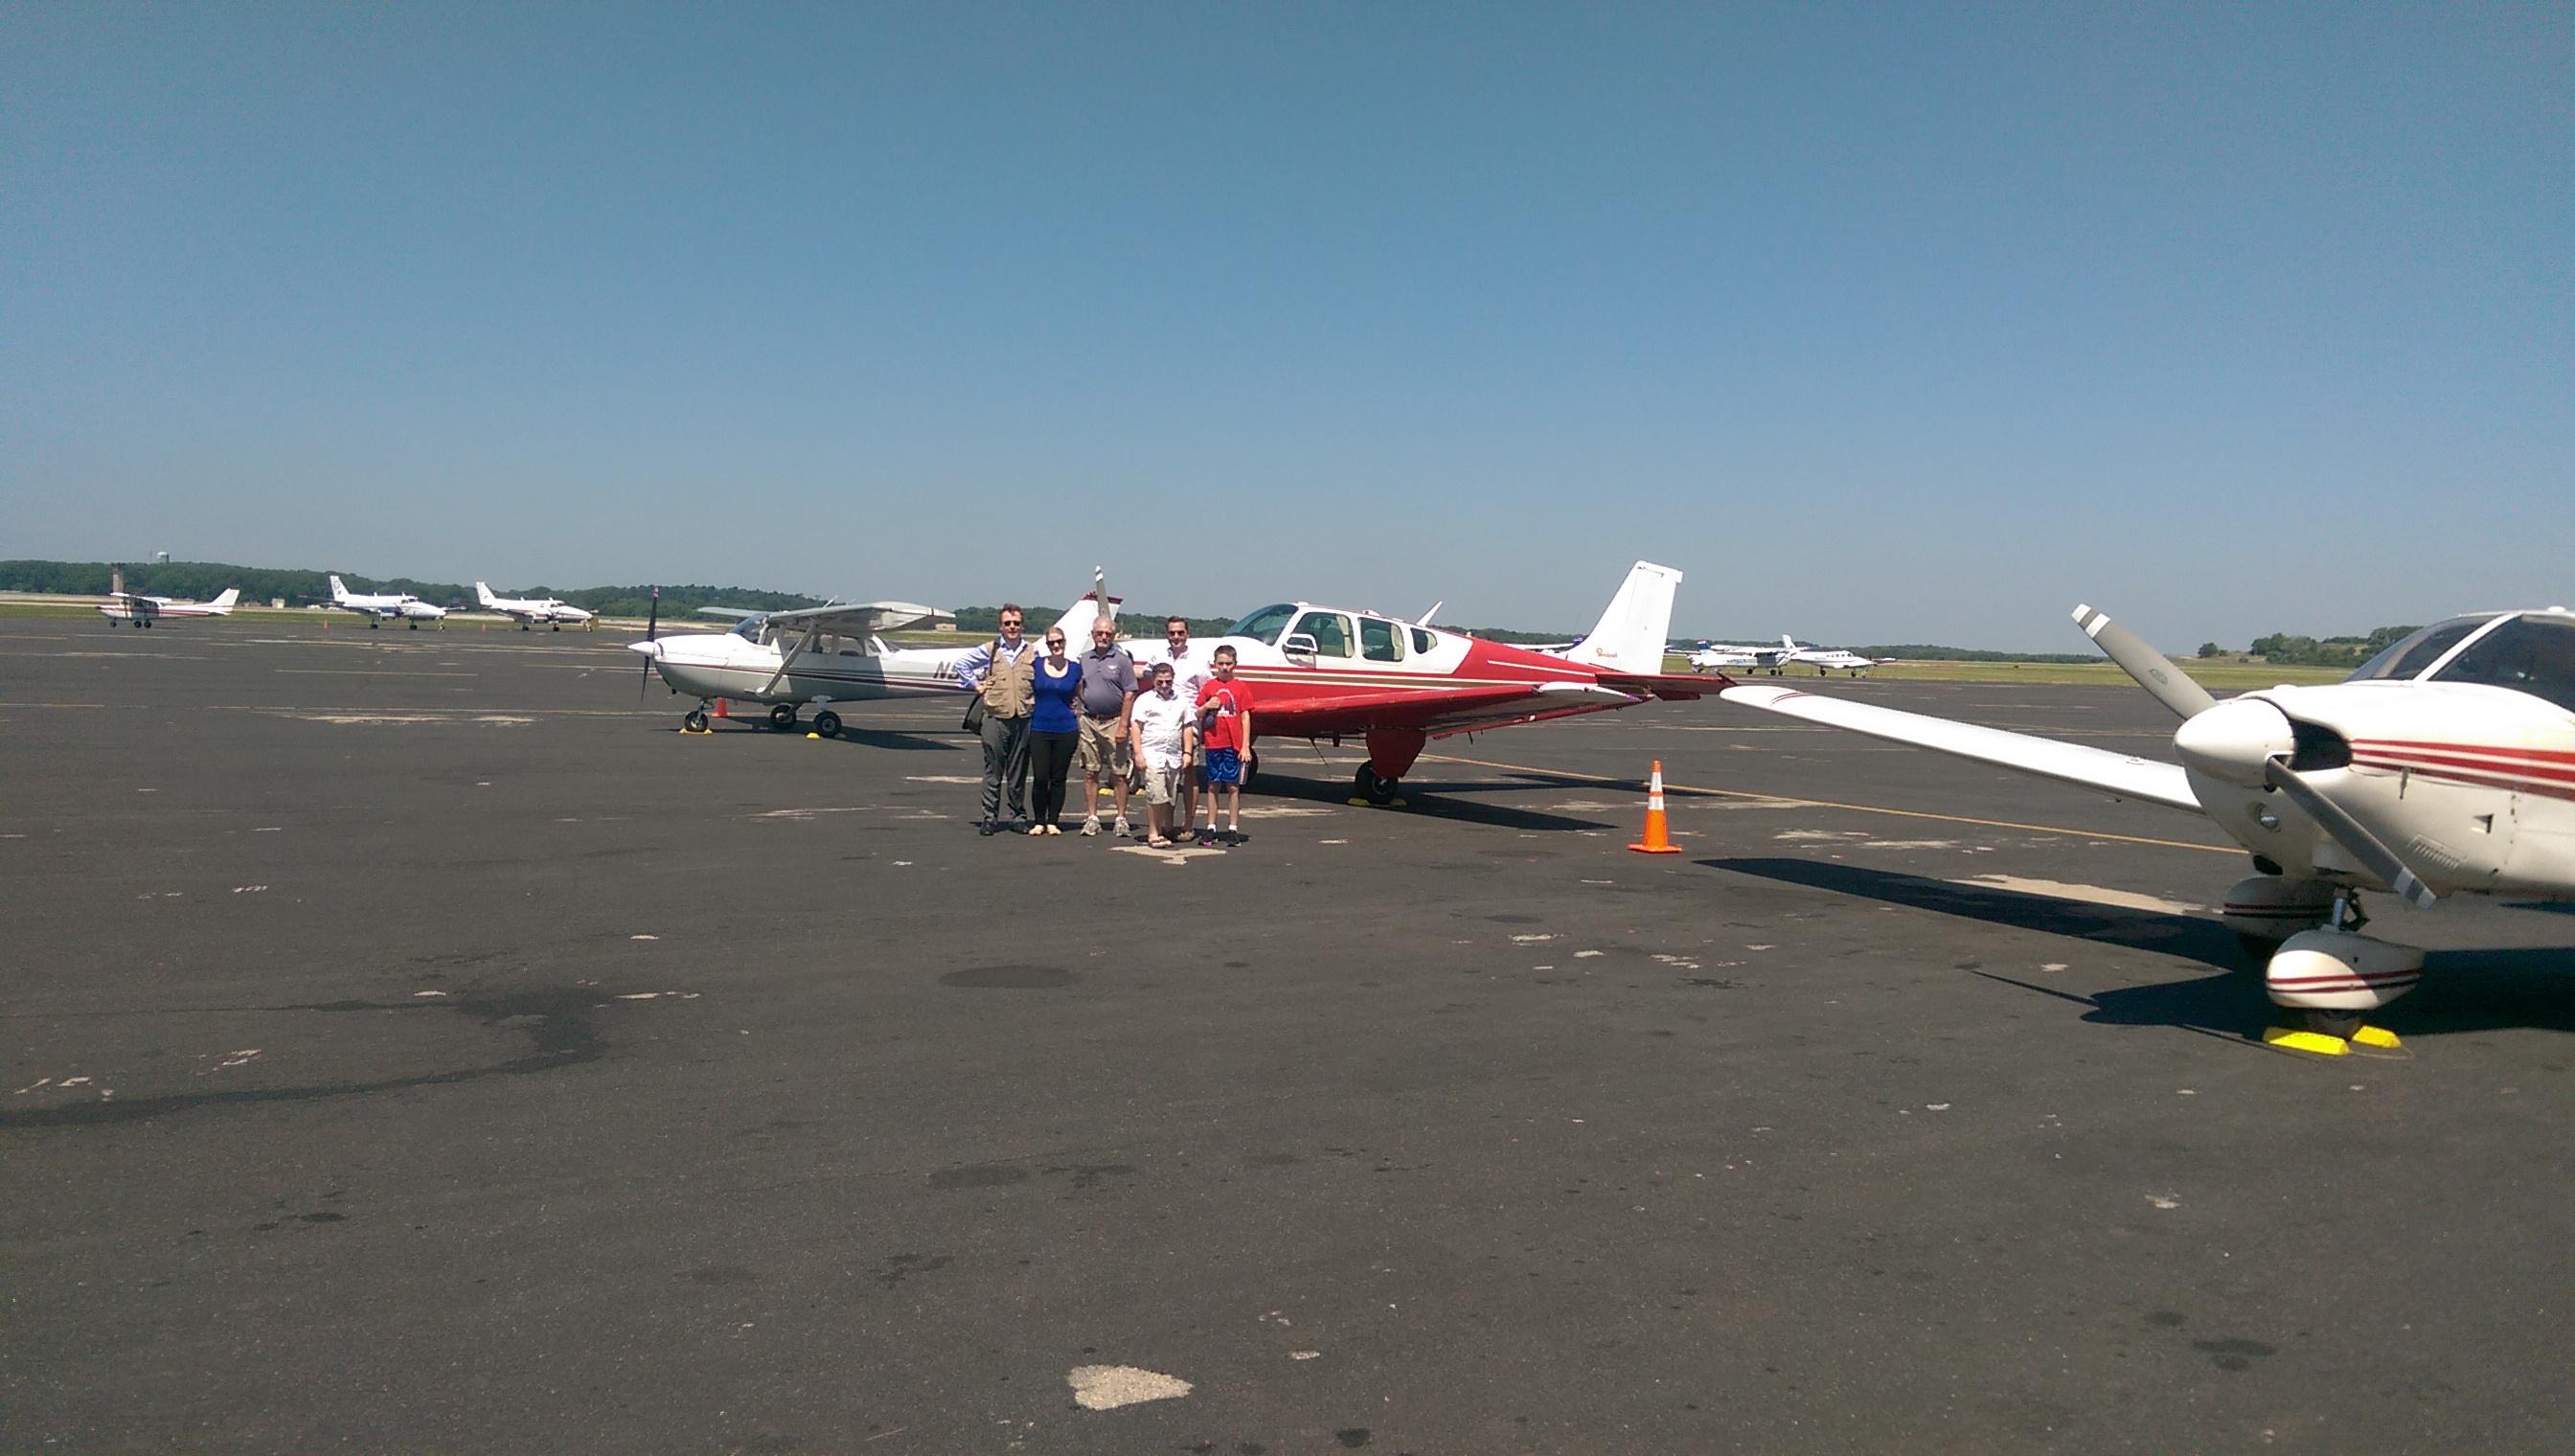 Club flyout to MSN